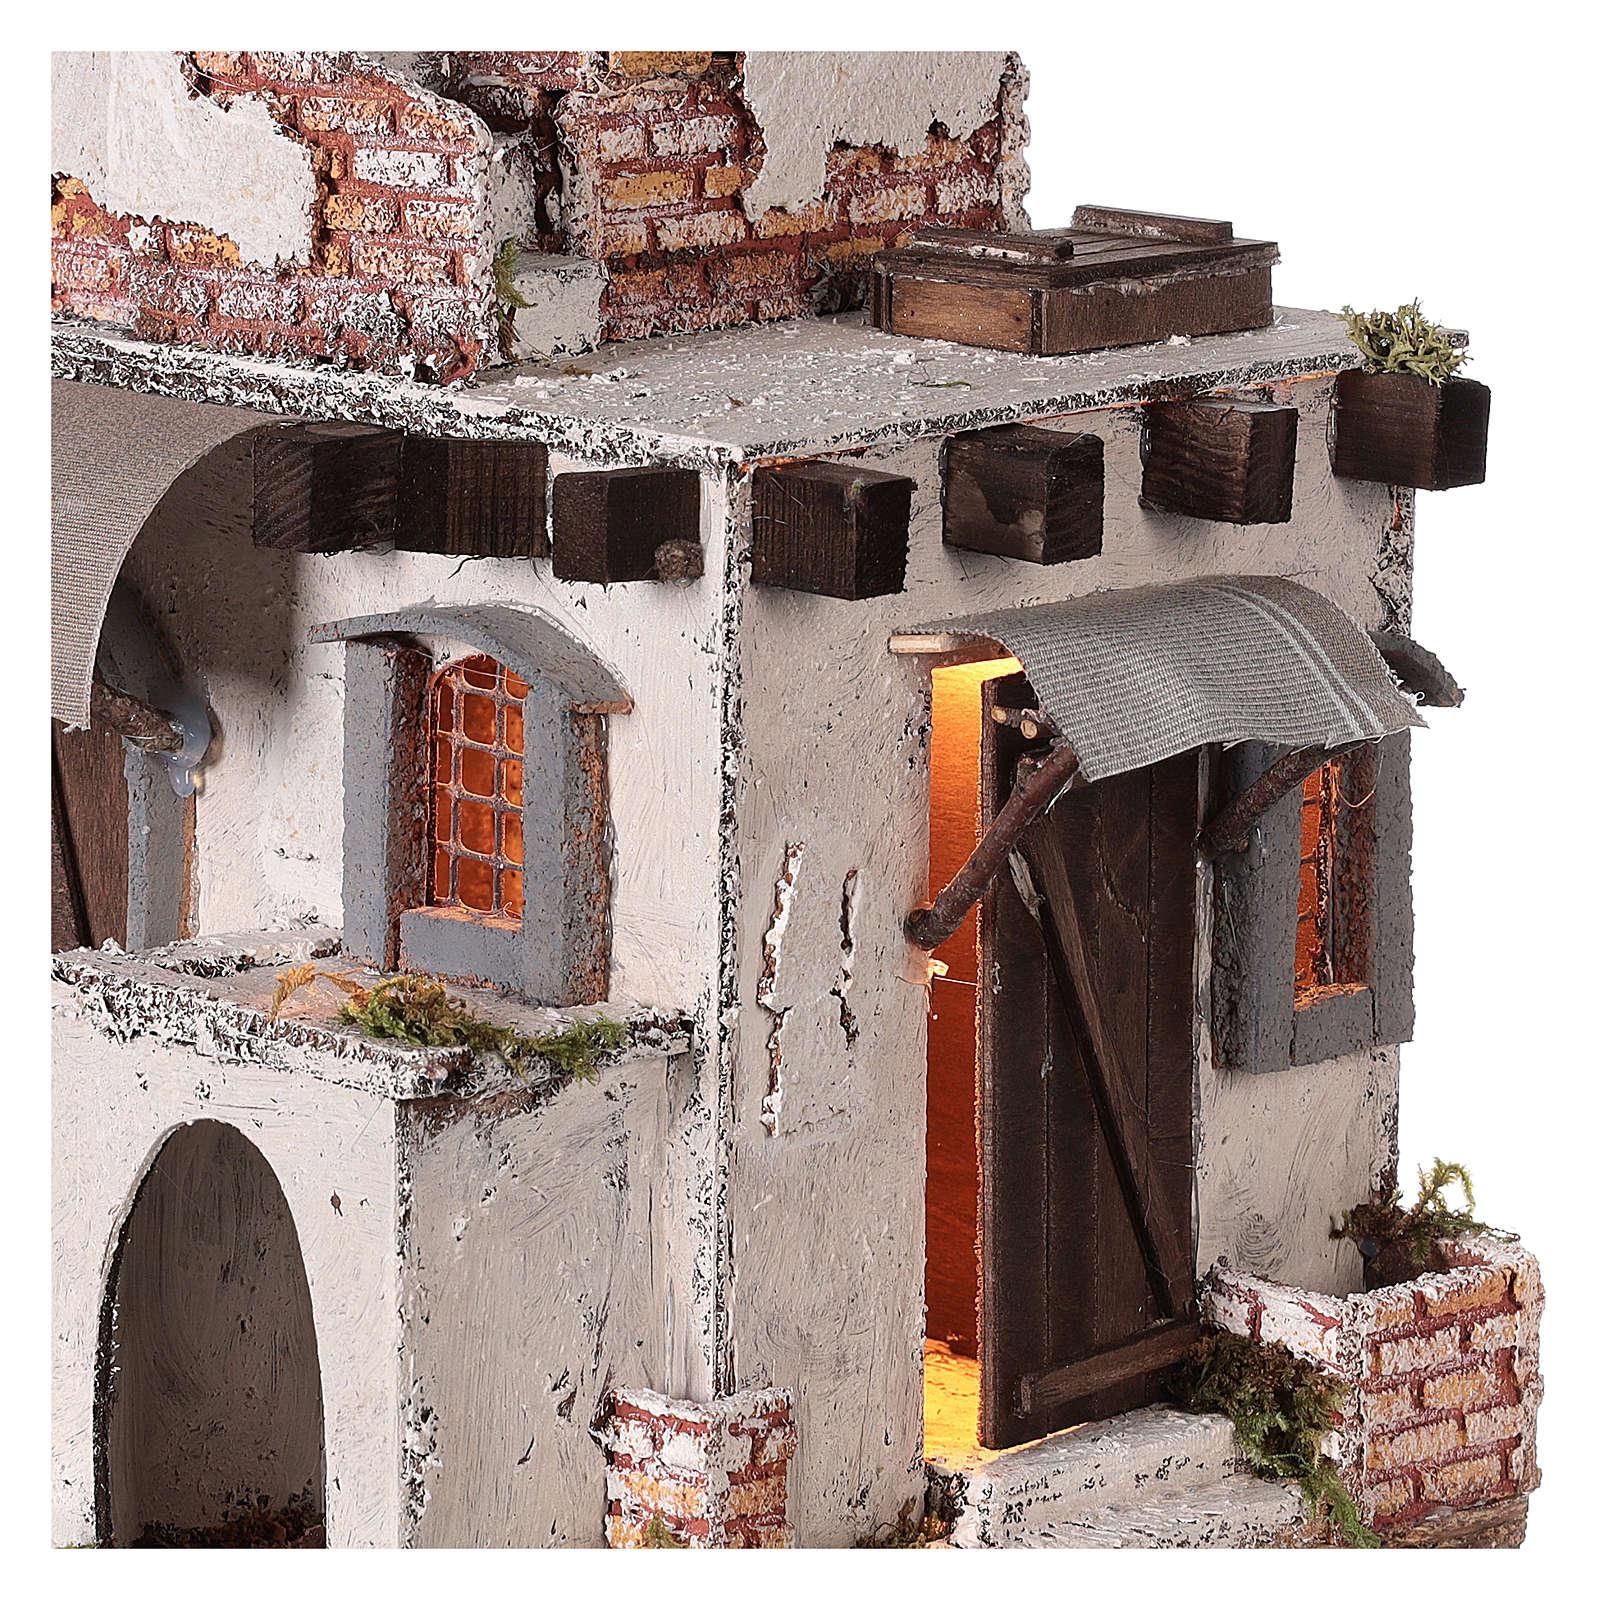 Neapolitan nativity scene Arabian style house with doors and windows 30x30x25 cm 4